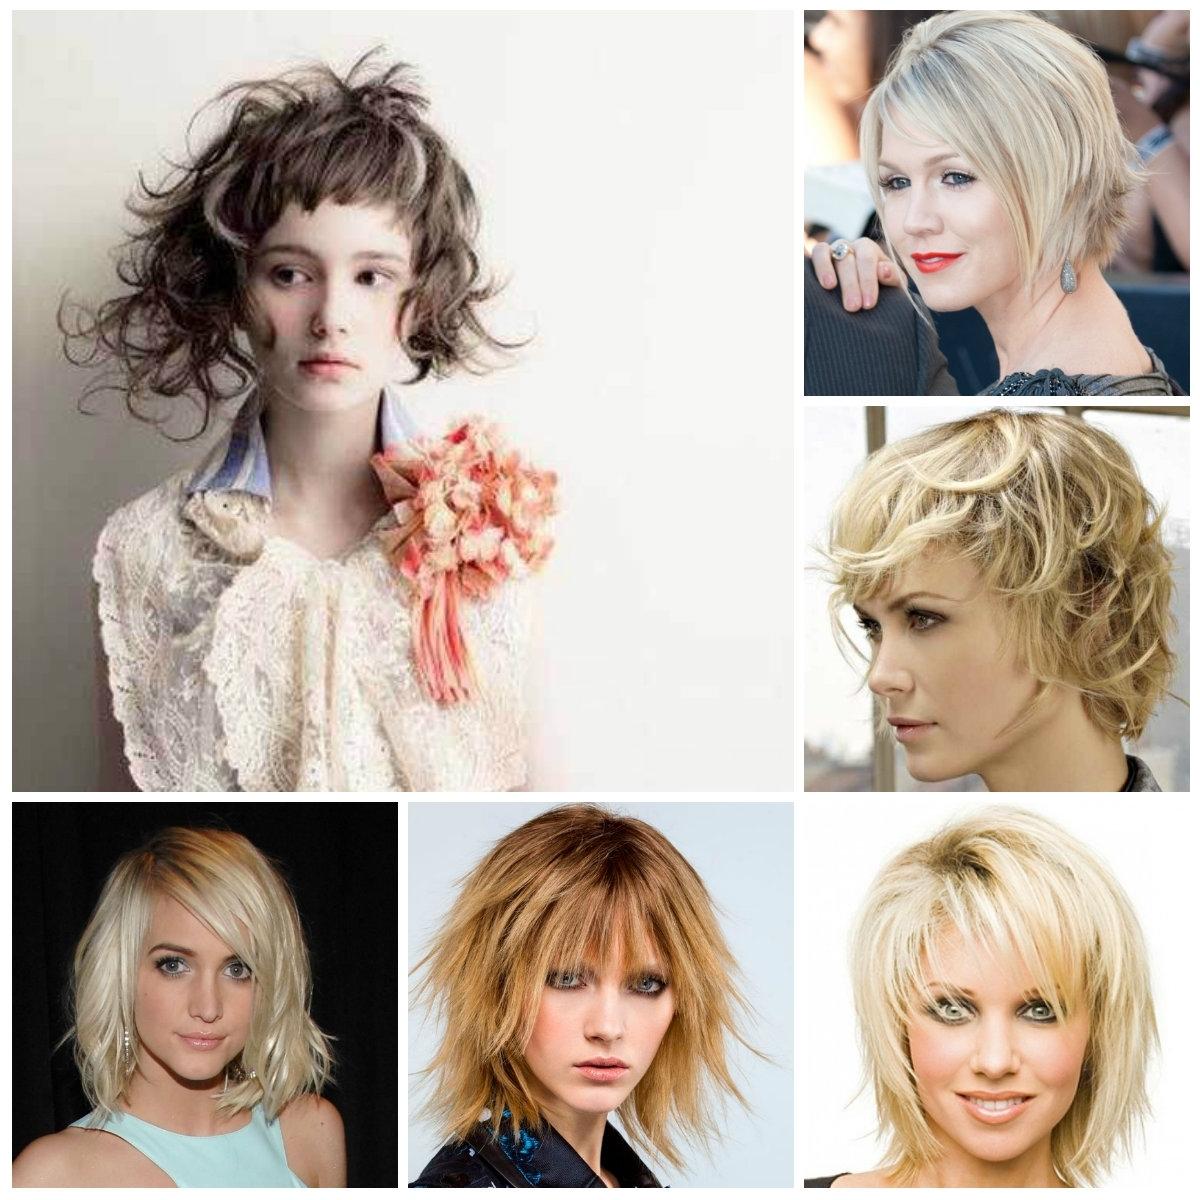 Popular Short Shaggy Hairstyles Thin Hair Regarding Shag Hairstyles For Fine Hair (View 9 of 15)